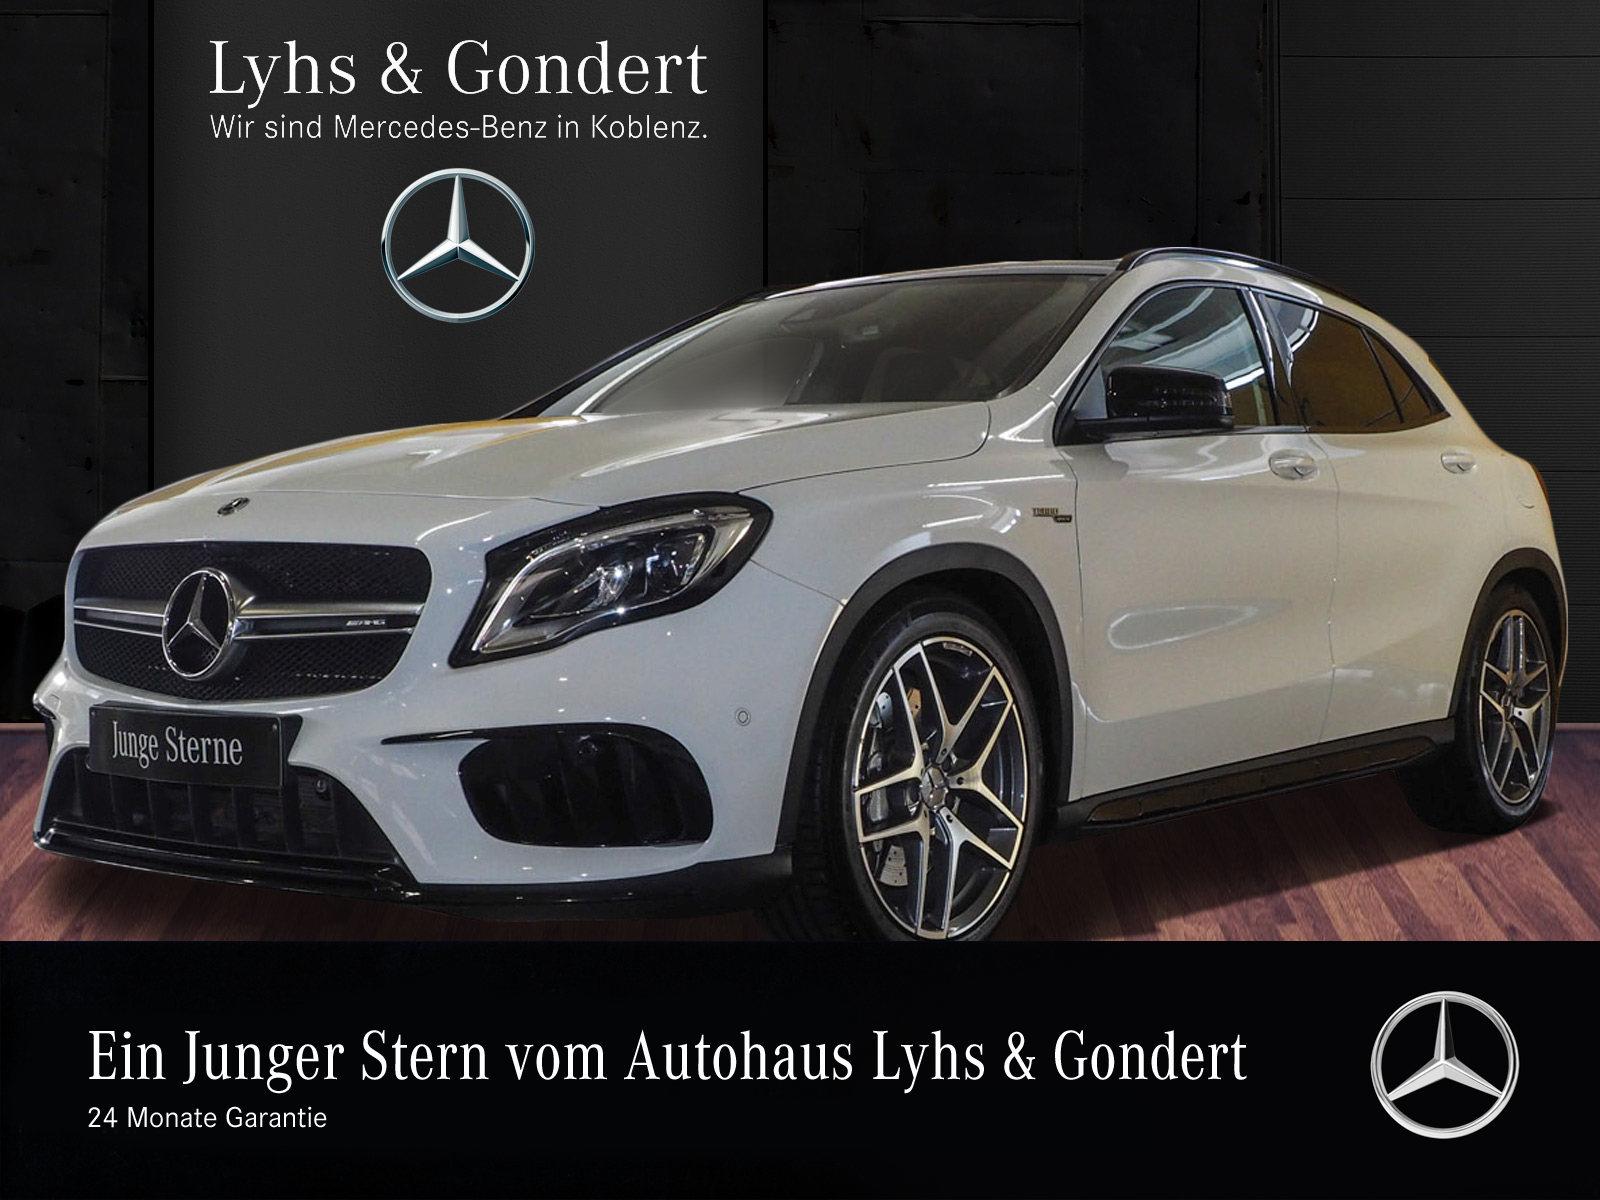 Mercedes-Benz AMG GLA 45 4MATIC *Panoramadach*Night-Paket*COMA, Jahr 2018, Benzin